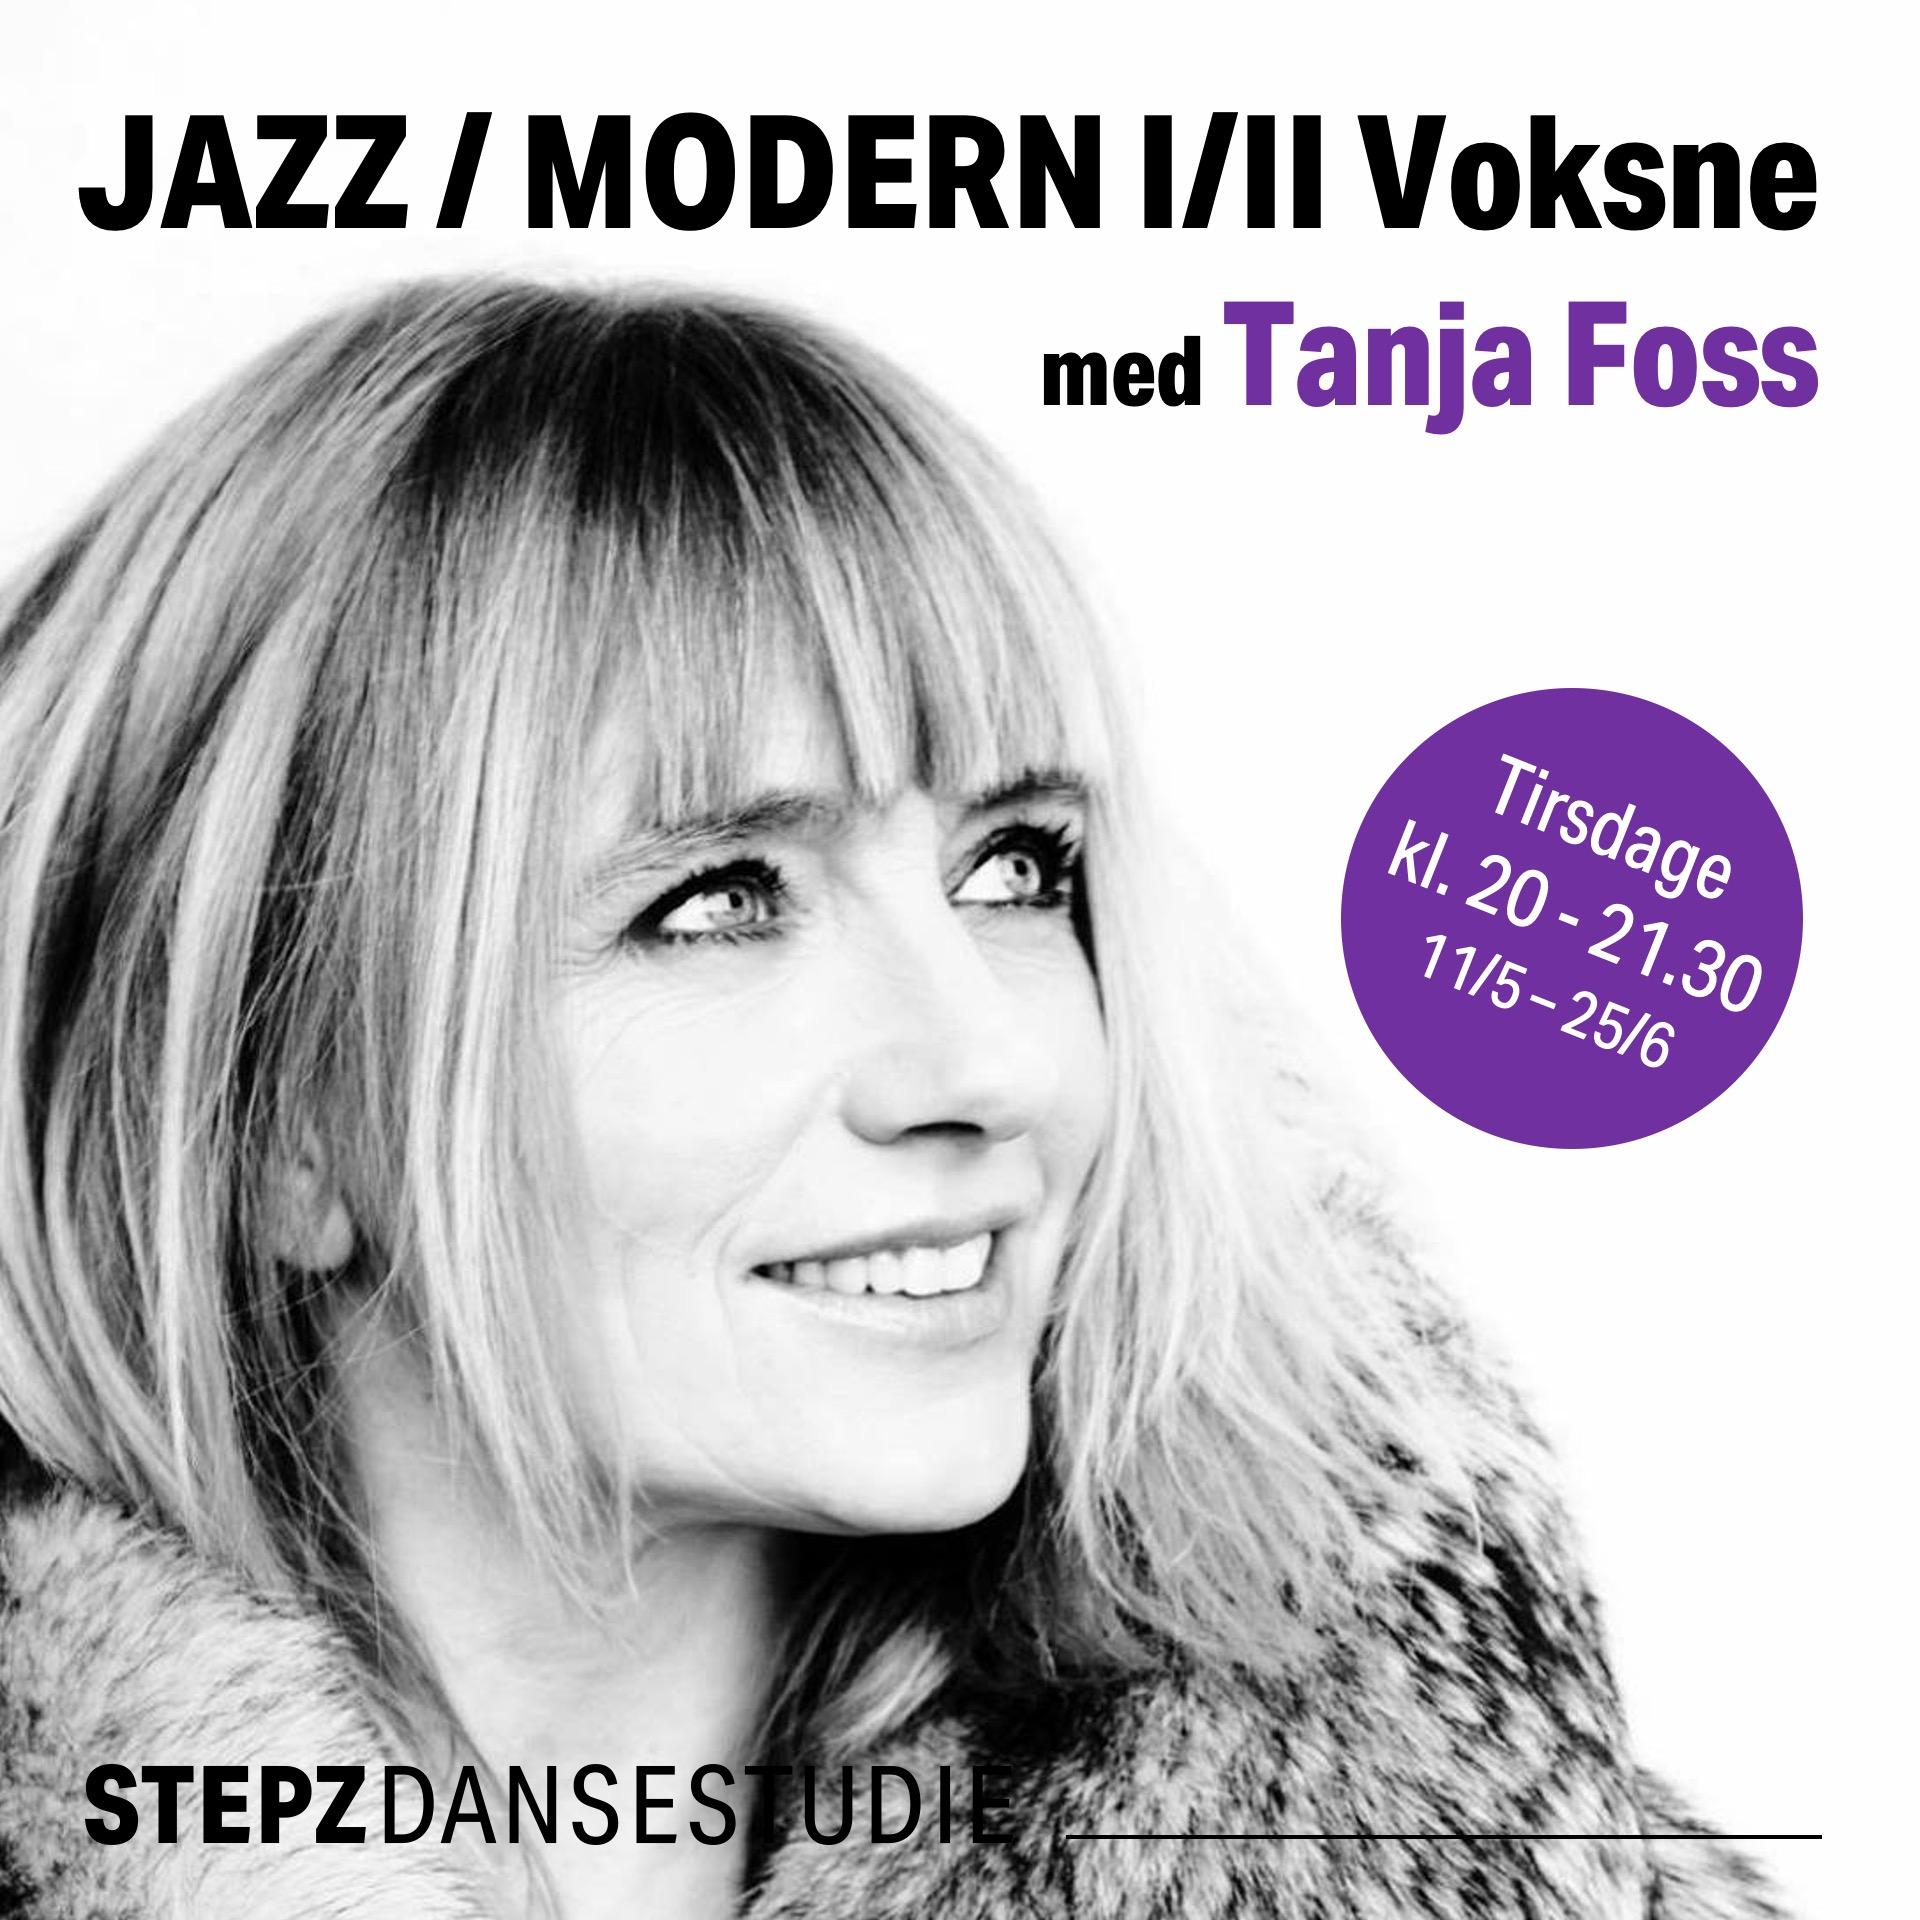 Jazz/Modern m. Tanja Foss